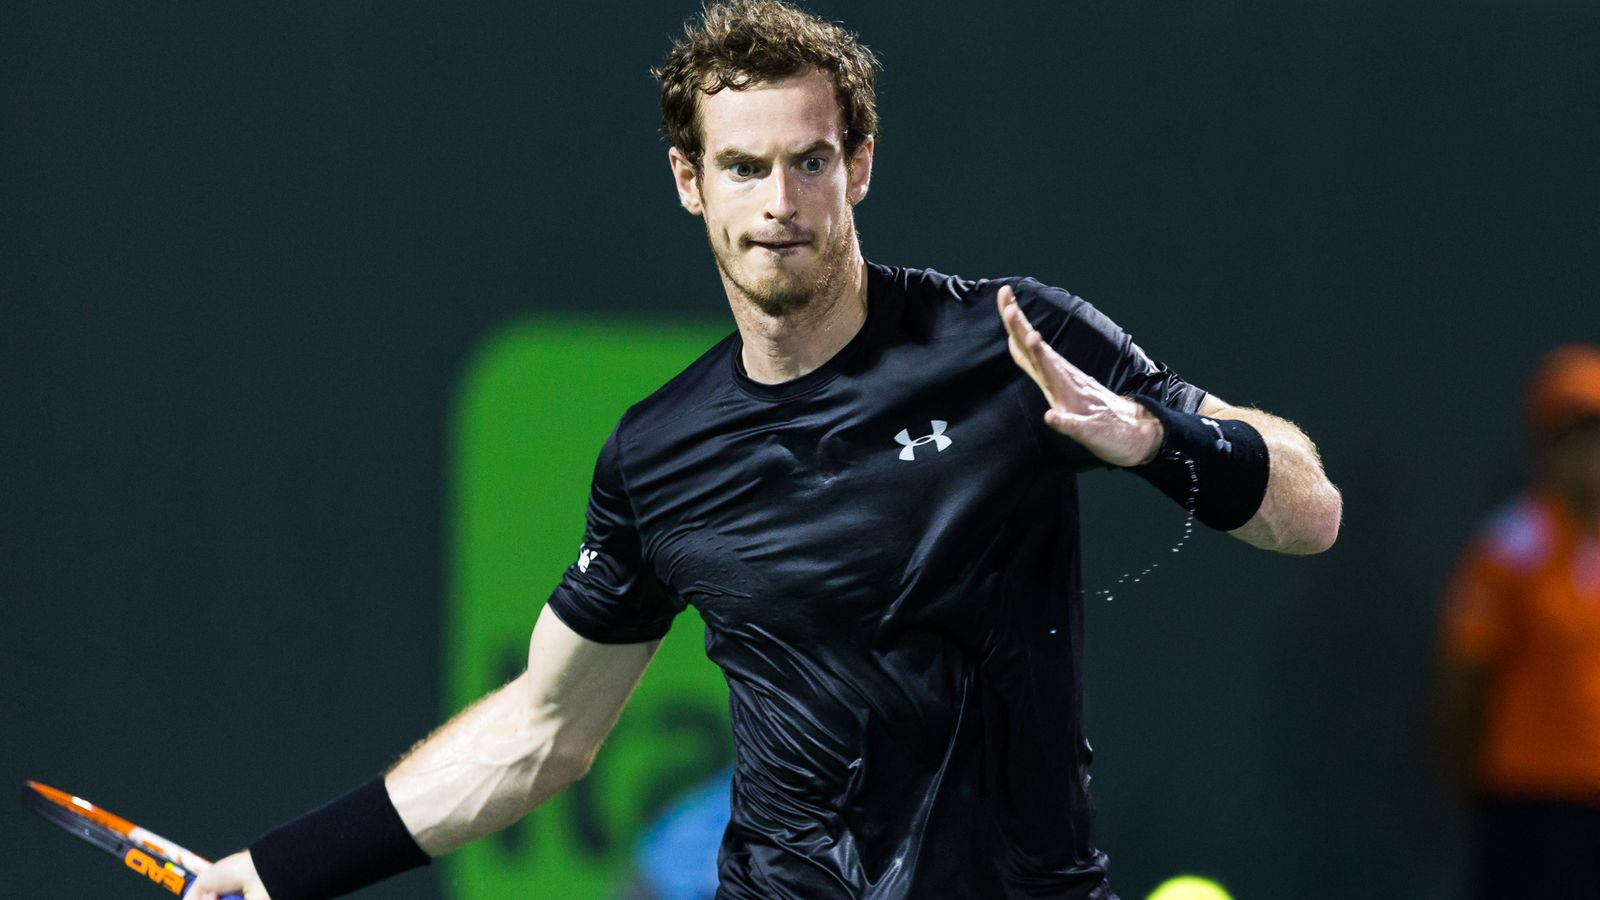 Cincinnati Open 2021: Andy Murray vs Richard Gasquet Tennis Pick and Prediction